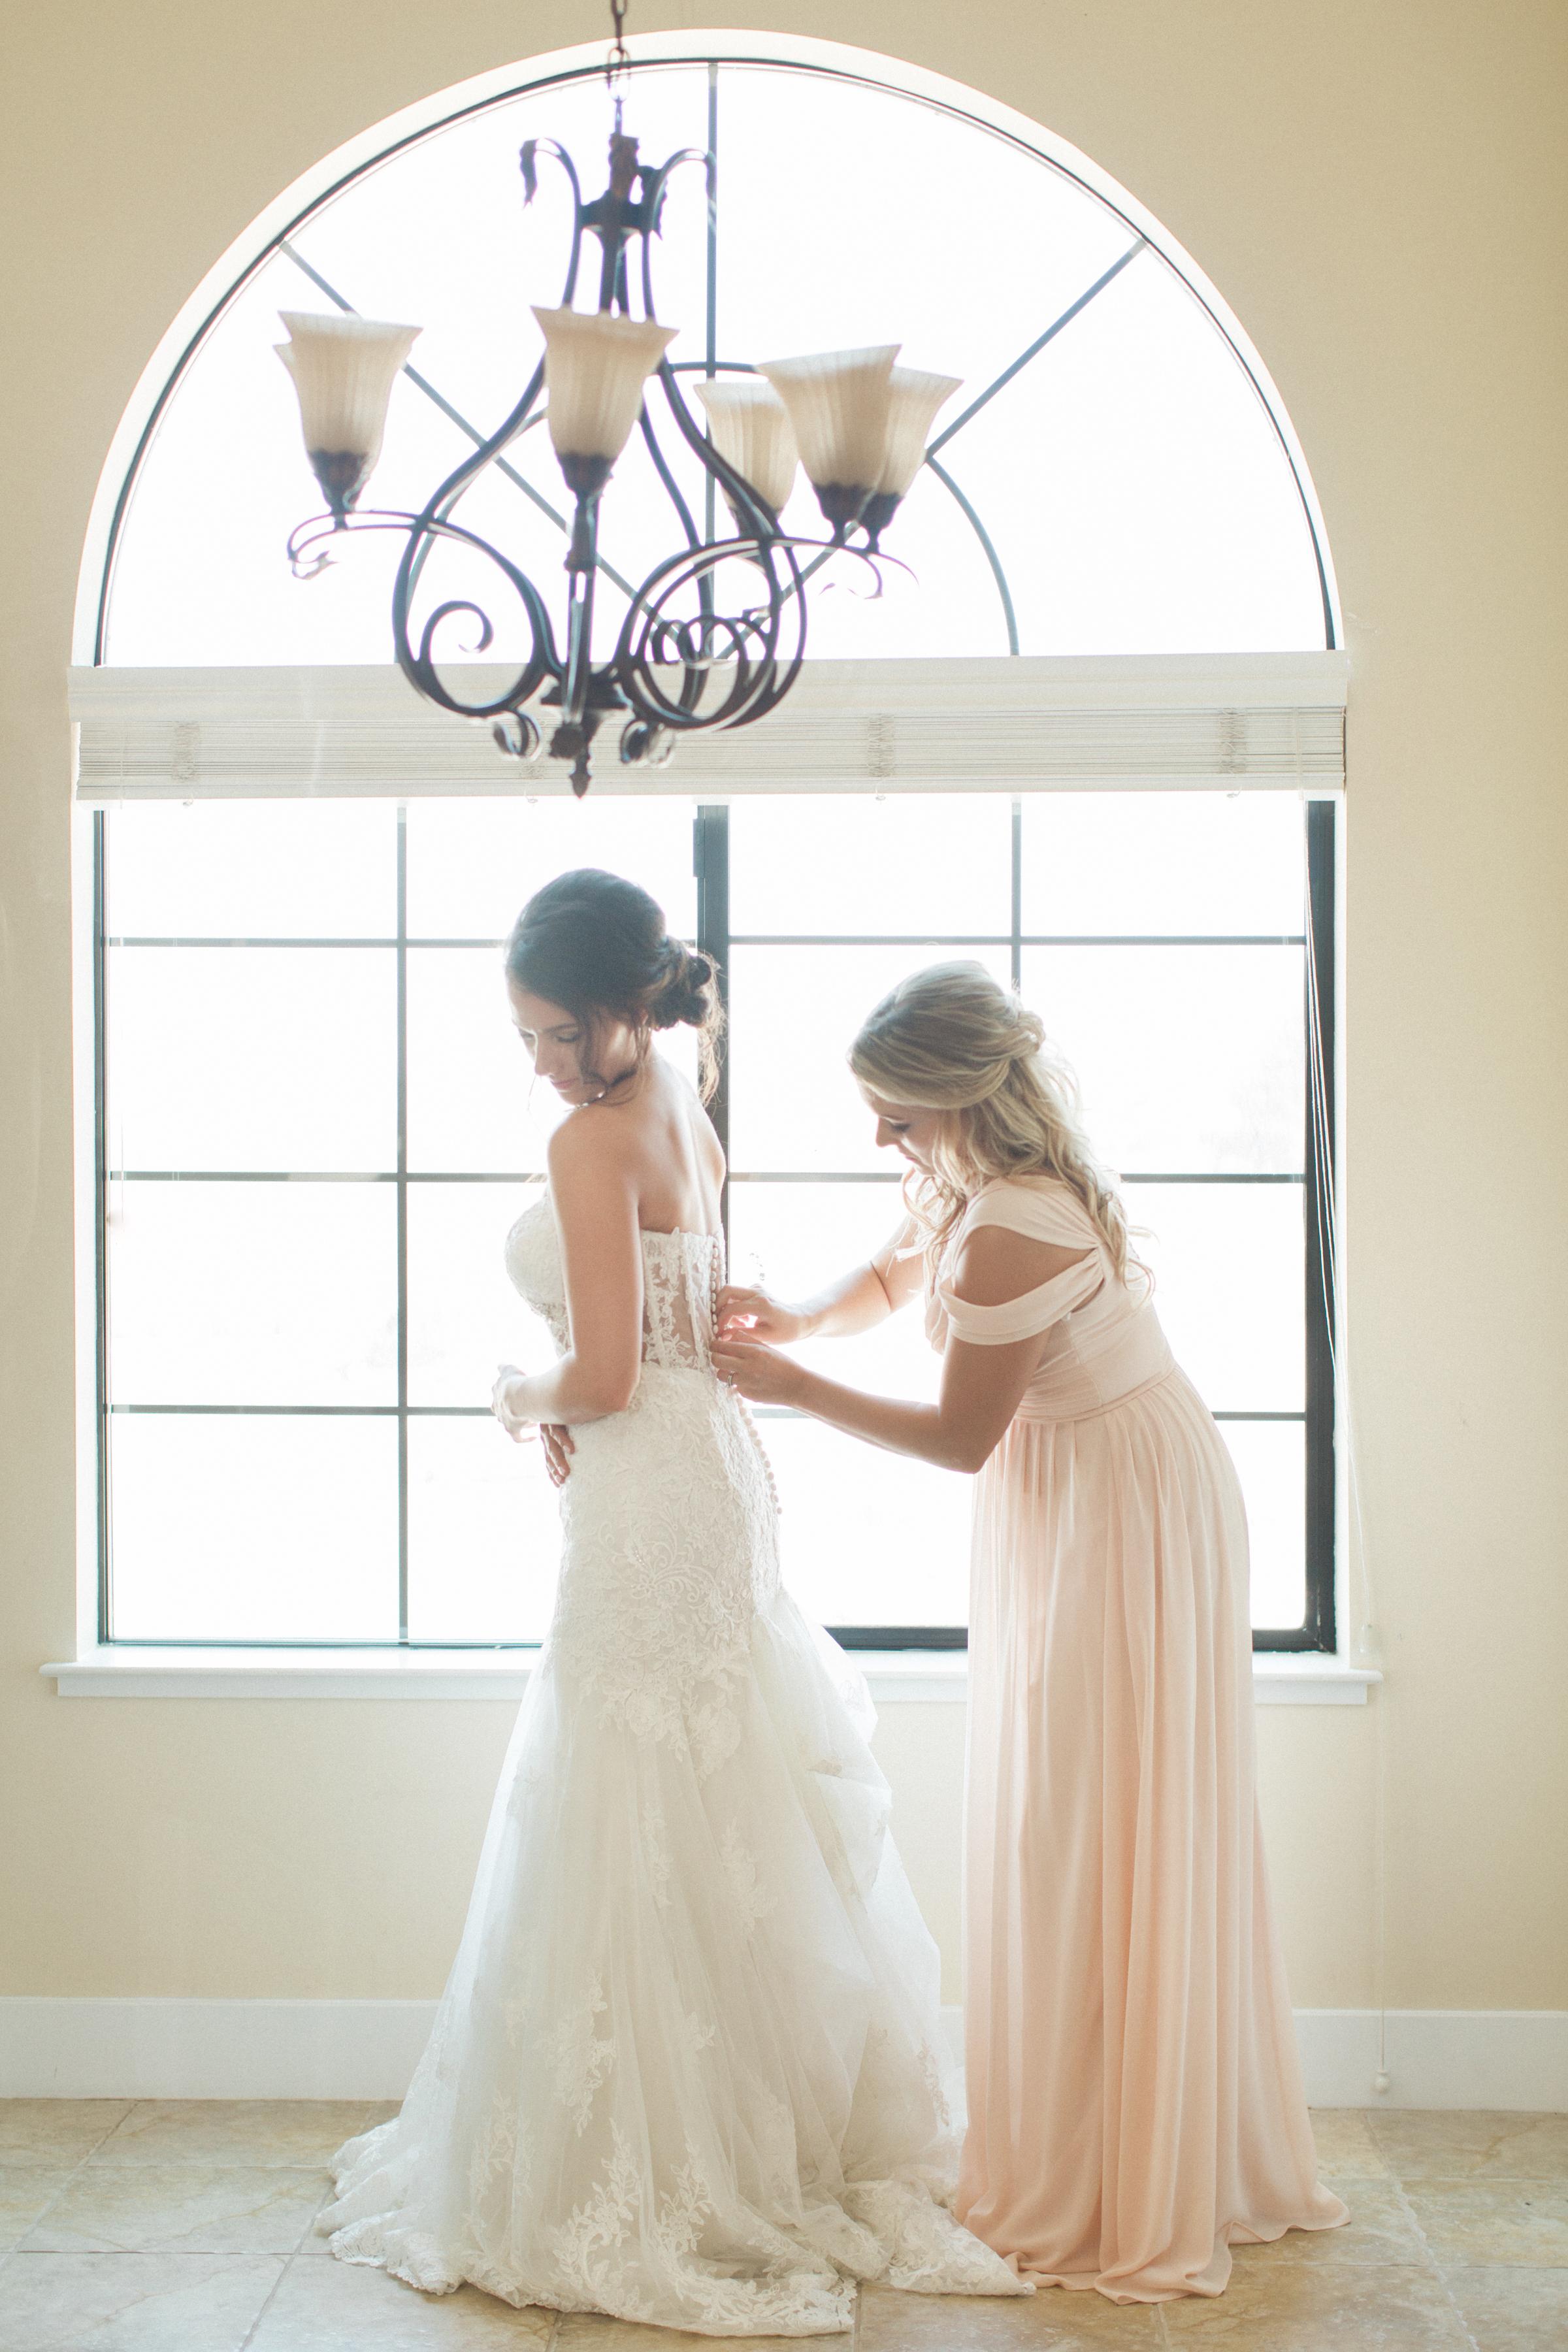 trynhphoto_socal_sf_halfmoon_bay_wedding_photographer_JA-49.jpg